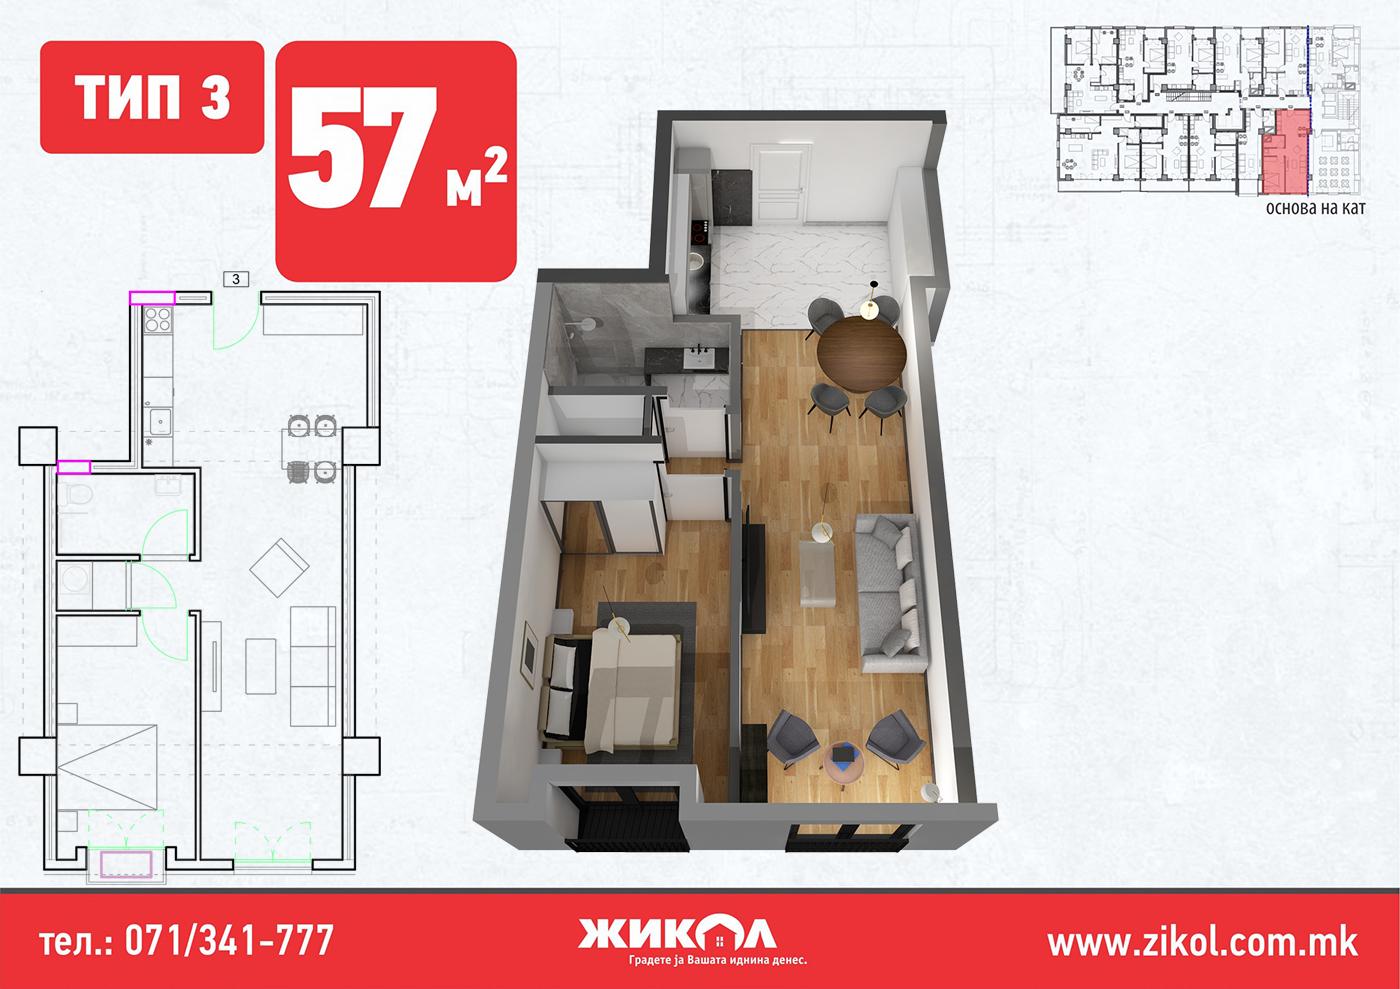 Зграда 55, кат 3, стан 23